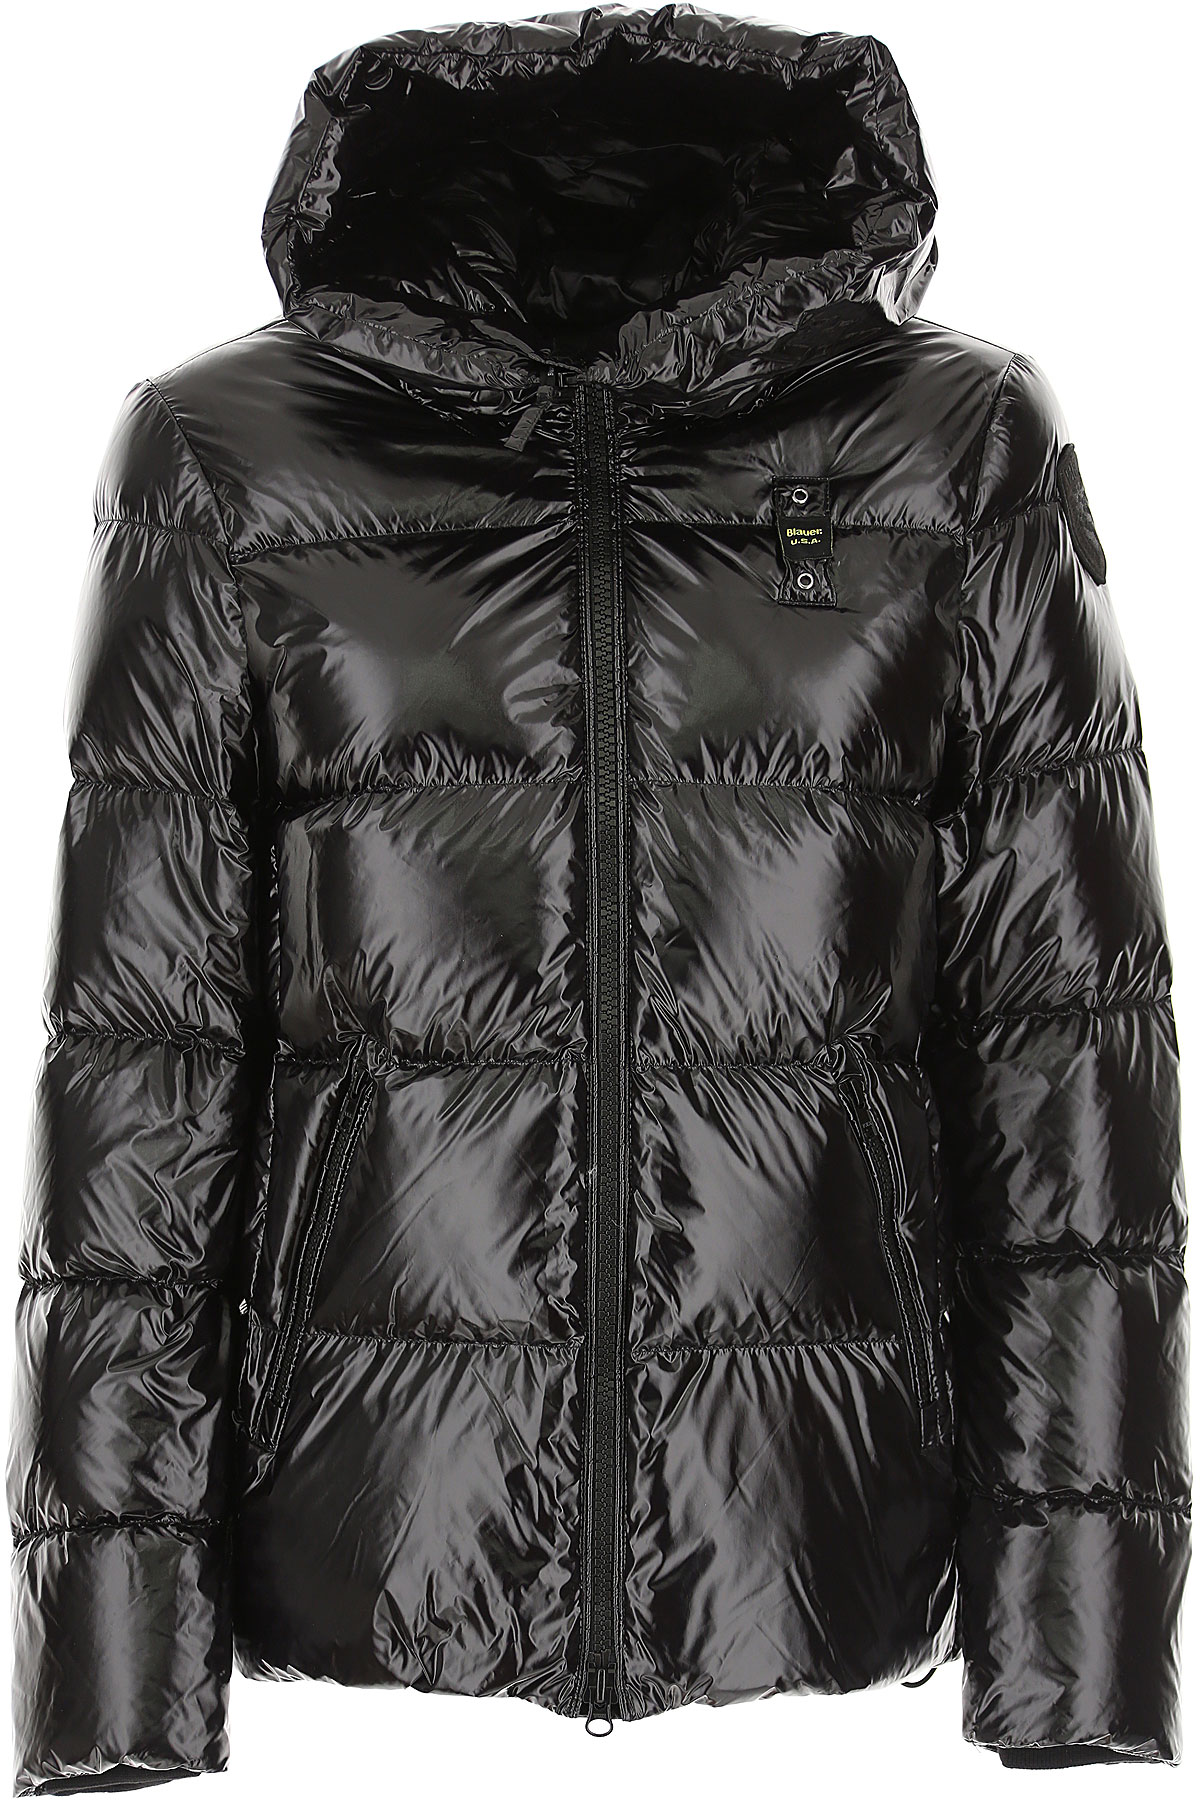 Blauer Down Jacket for Women, Puffer Ski Jacket On Sale, Black, polyester, 2019, 2 4 6 8